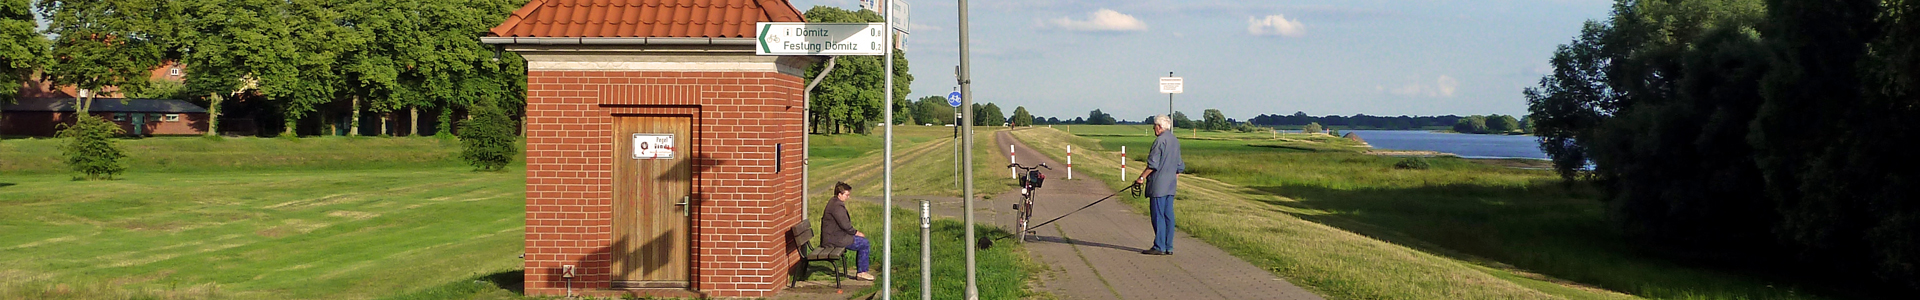 Elberadweg in Dömitz - Foto: Jörg Reichel